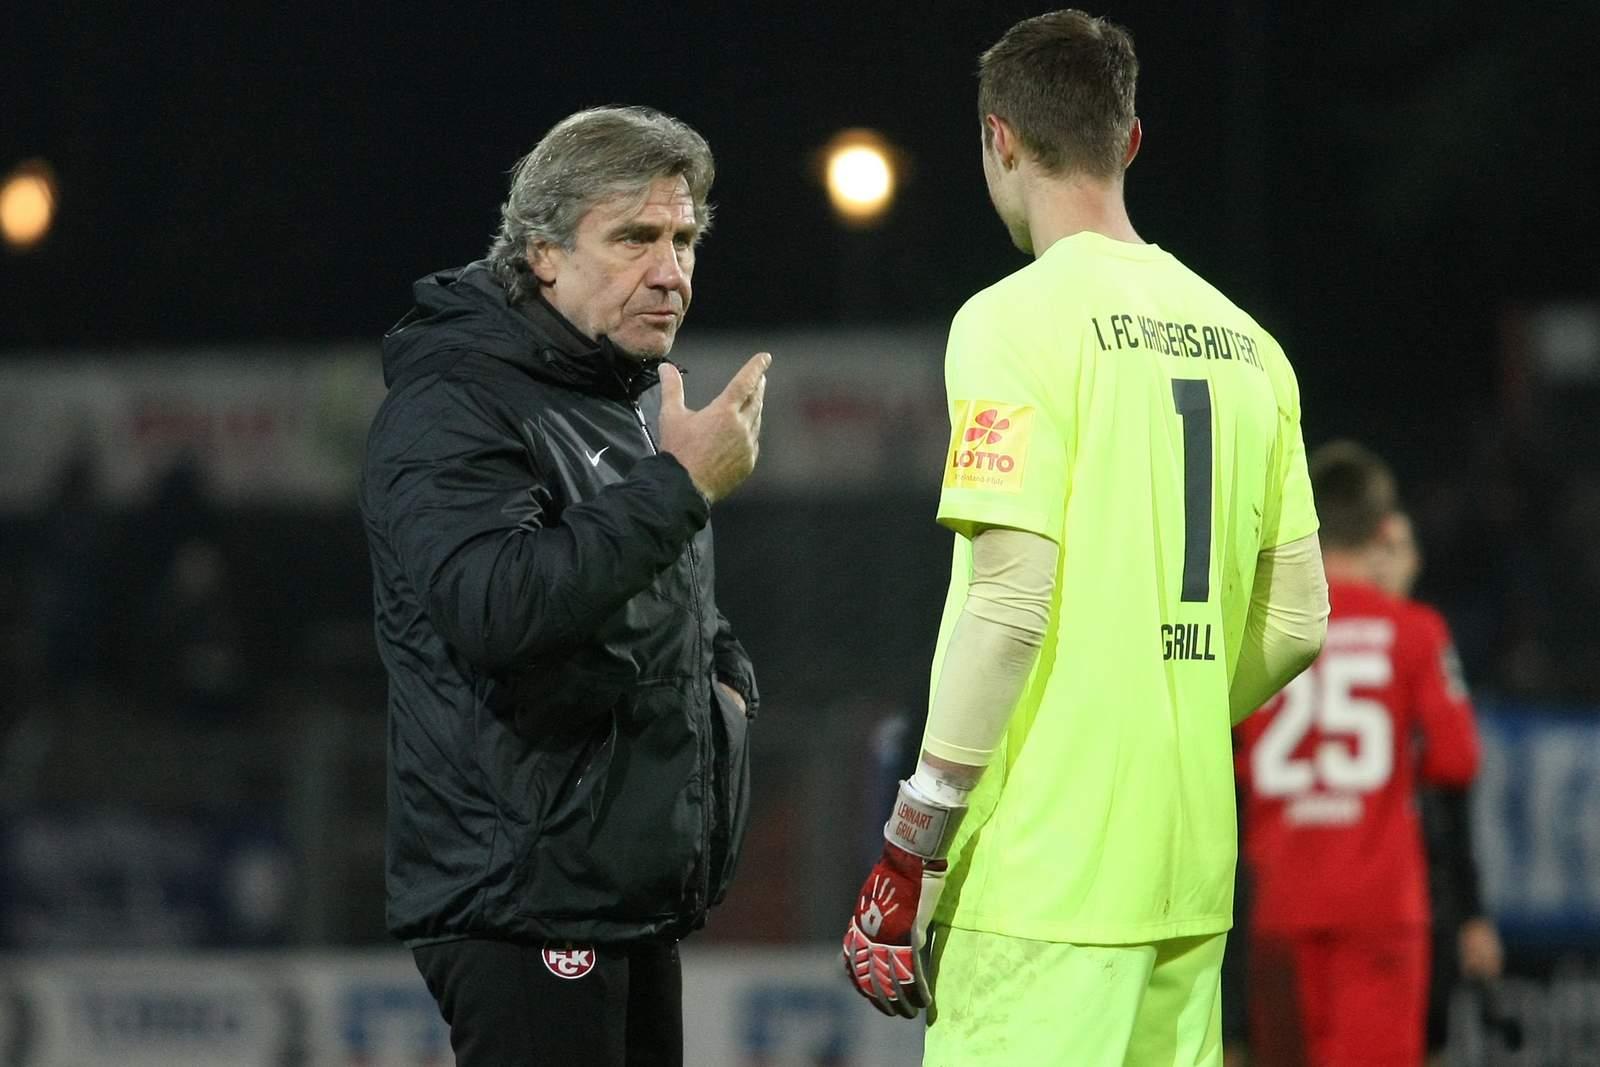 Gerry Ehrmann vom FCK mit Lennart Grill